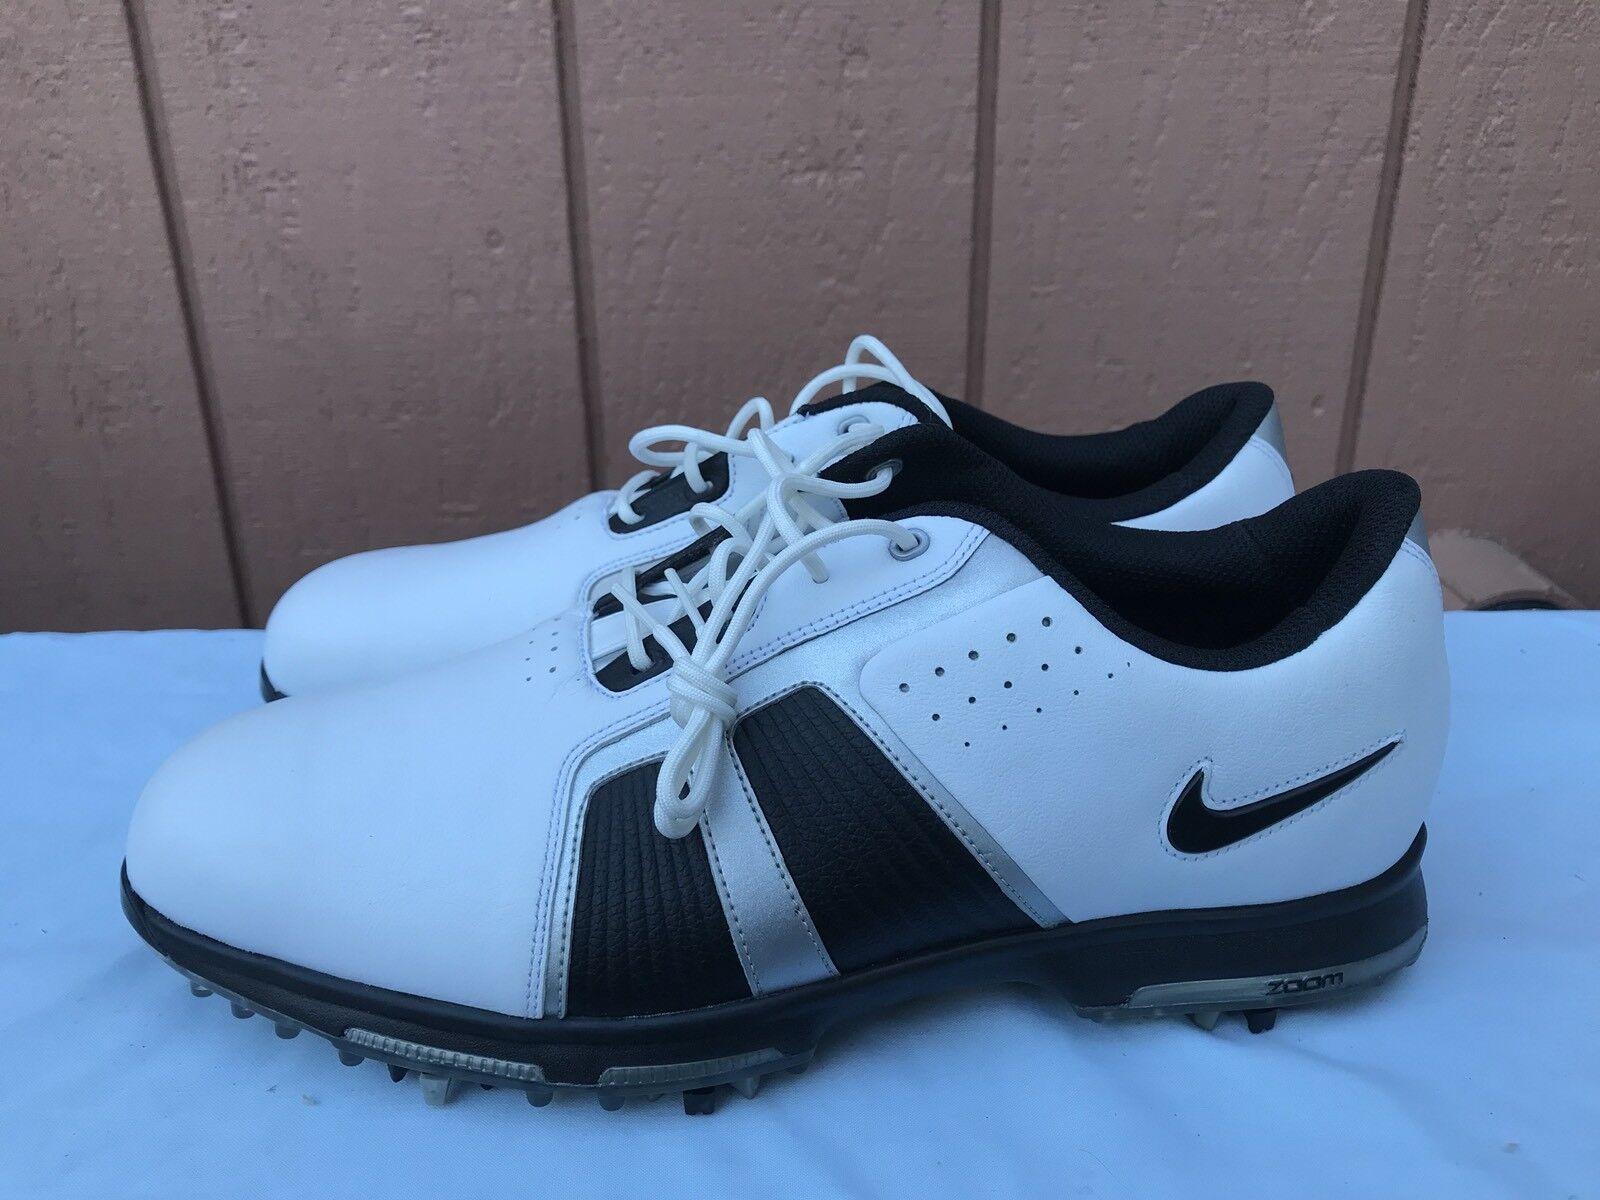 Nike zoom trofeo uomini '10 483246 101 cuoio bianco impermeabile scarpe da golf a2